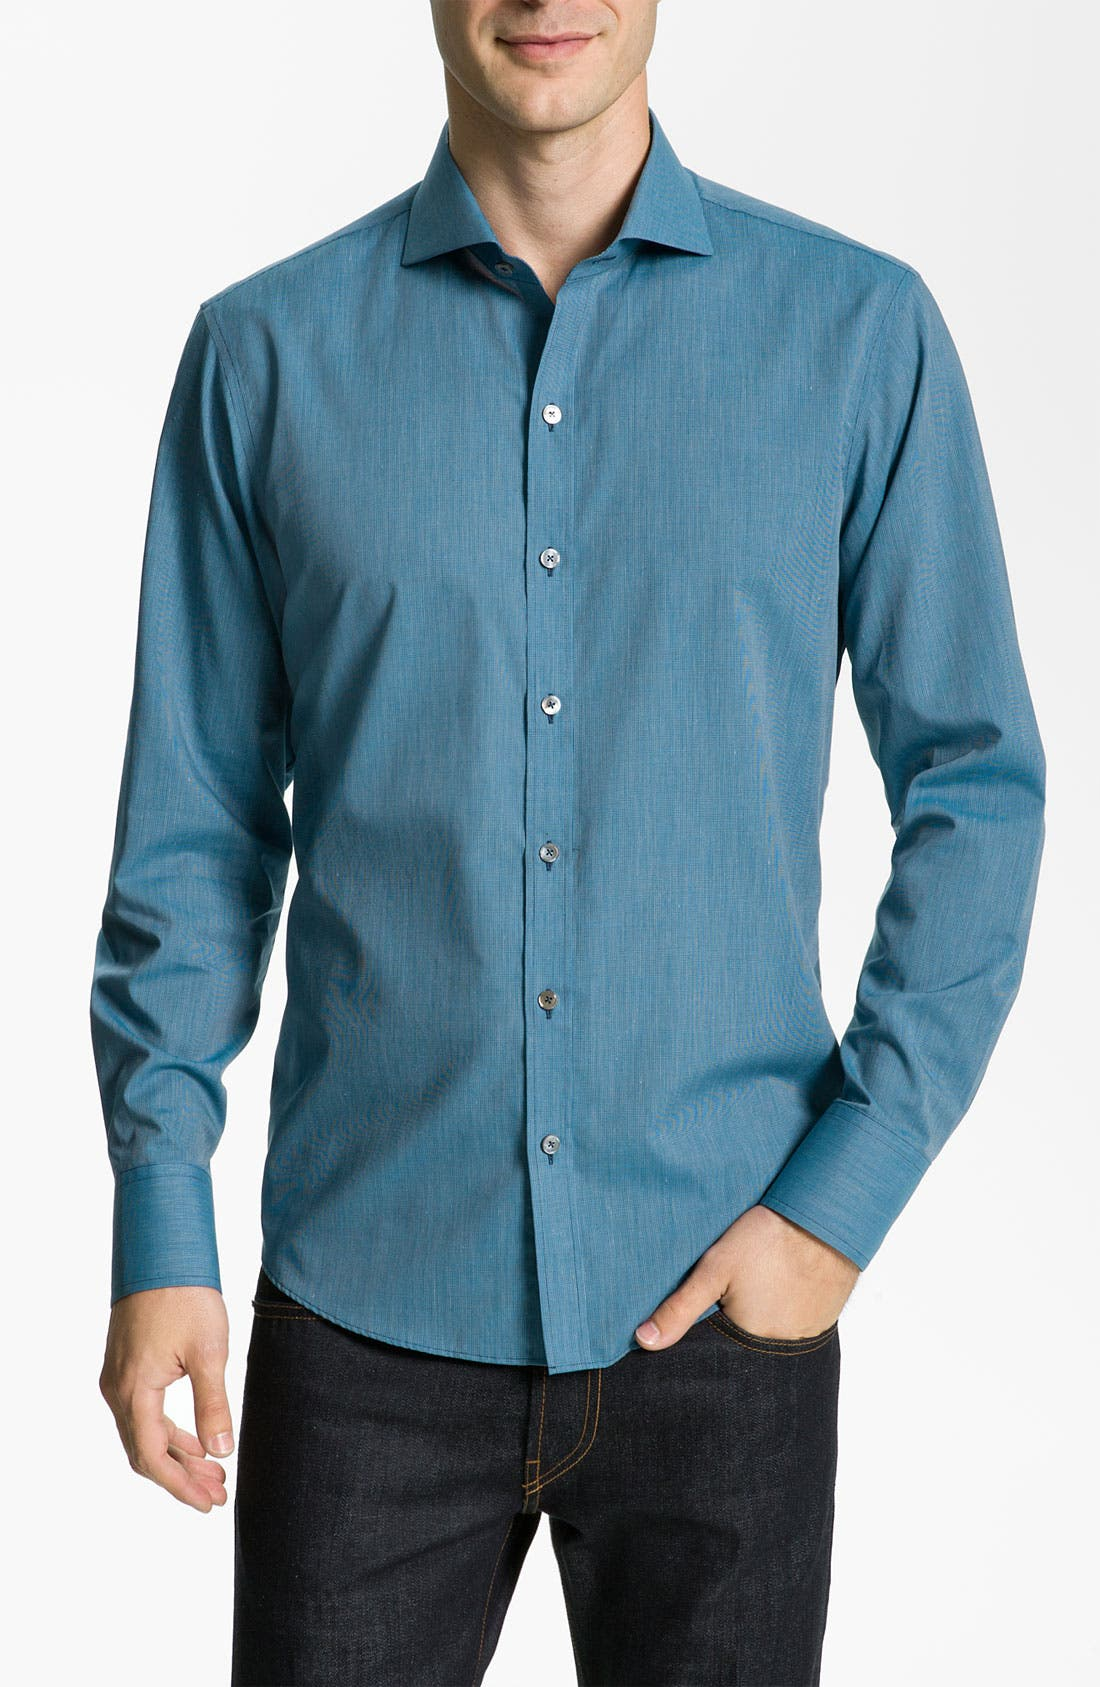 Alternate Image 1 Selected - Zachary Prell 'Andrisen' Sport Shirt